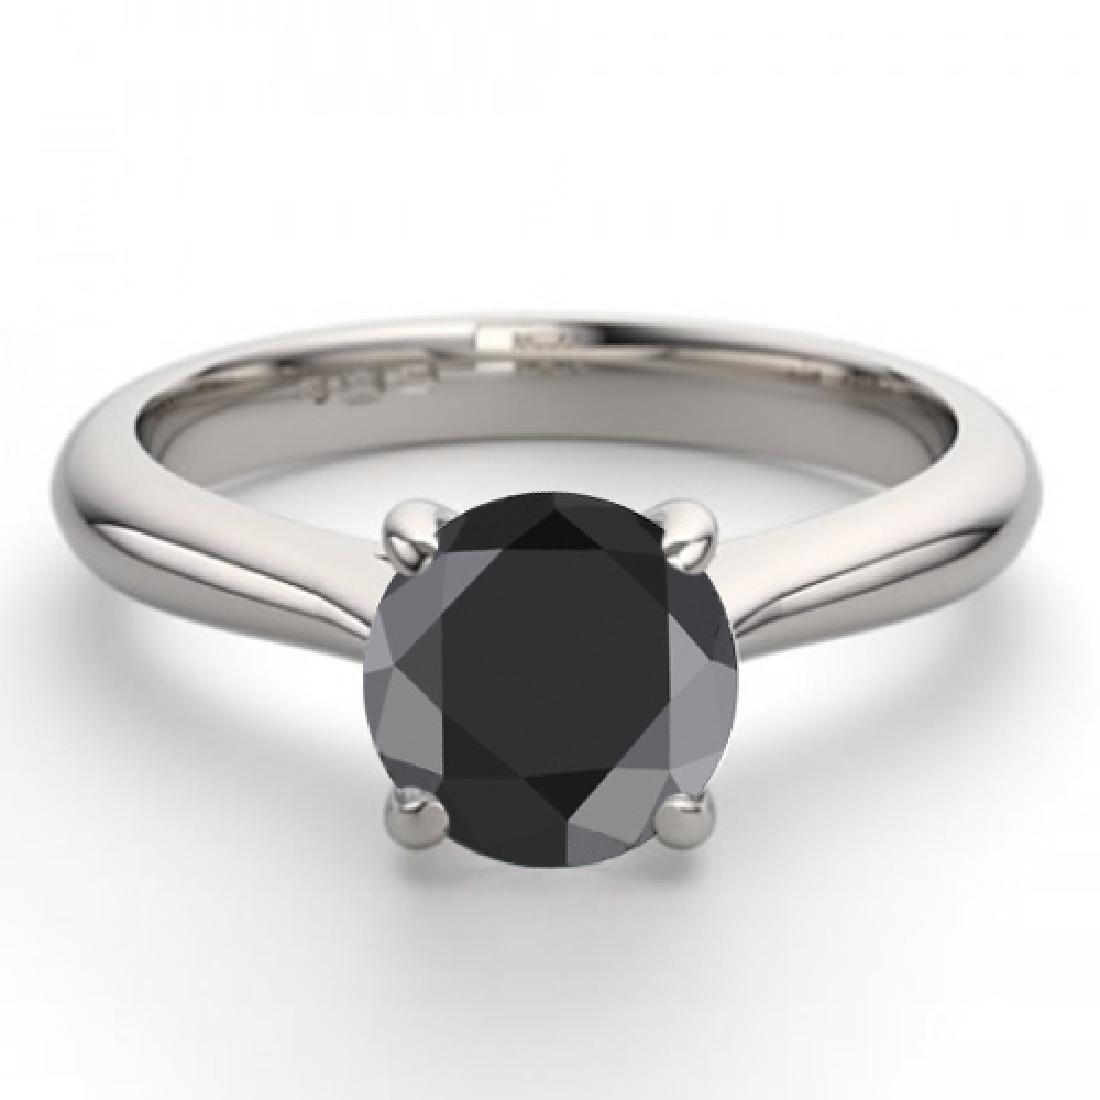 14K White Gold Jewelry 0.83 ctw Black Diamond Solitaire